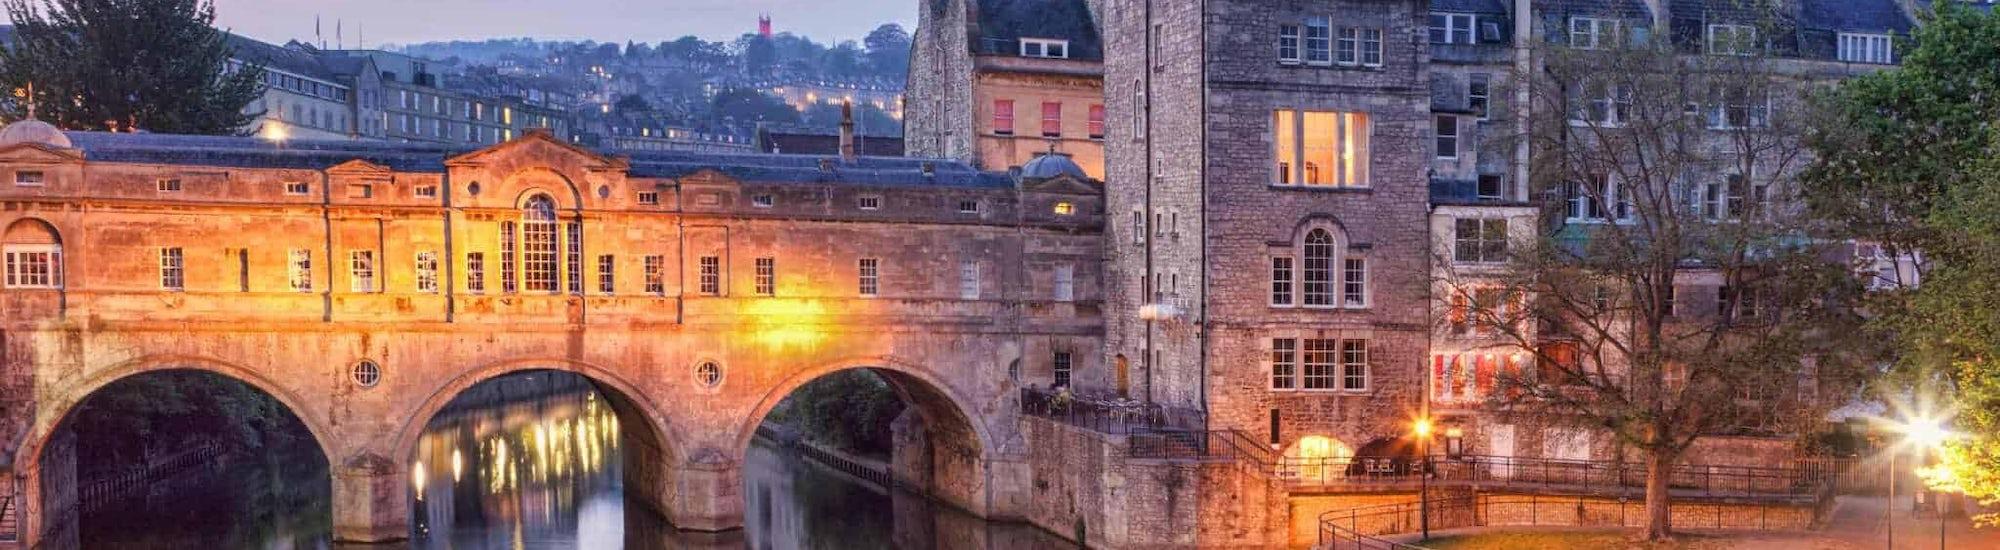 Bath Historic